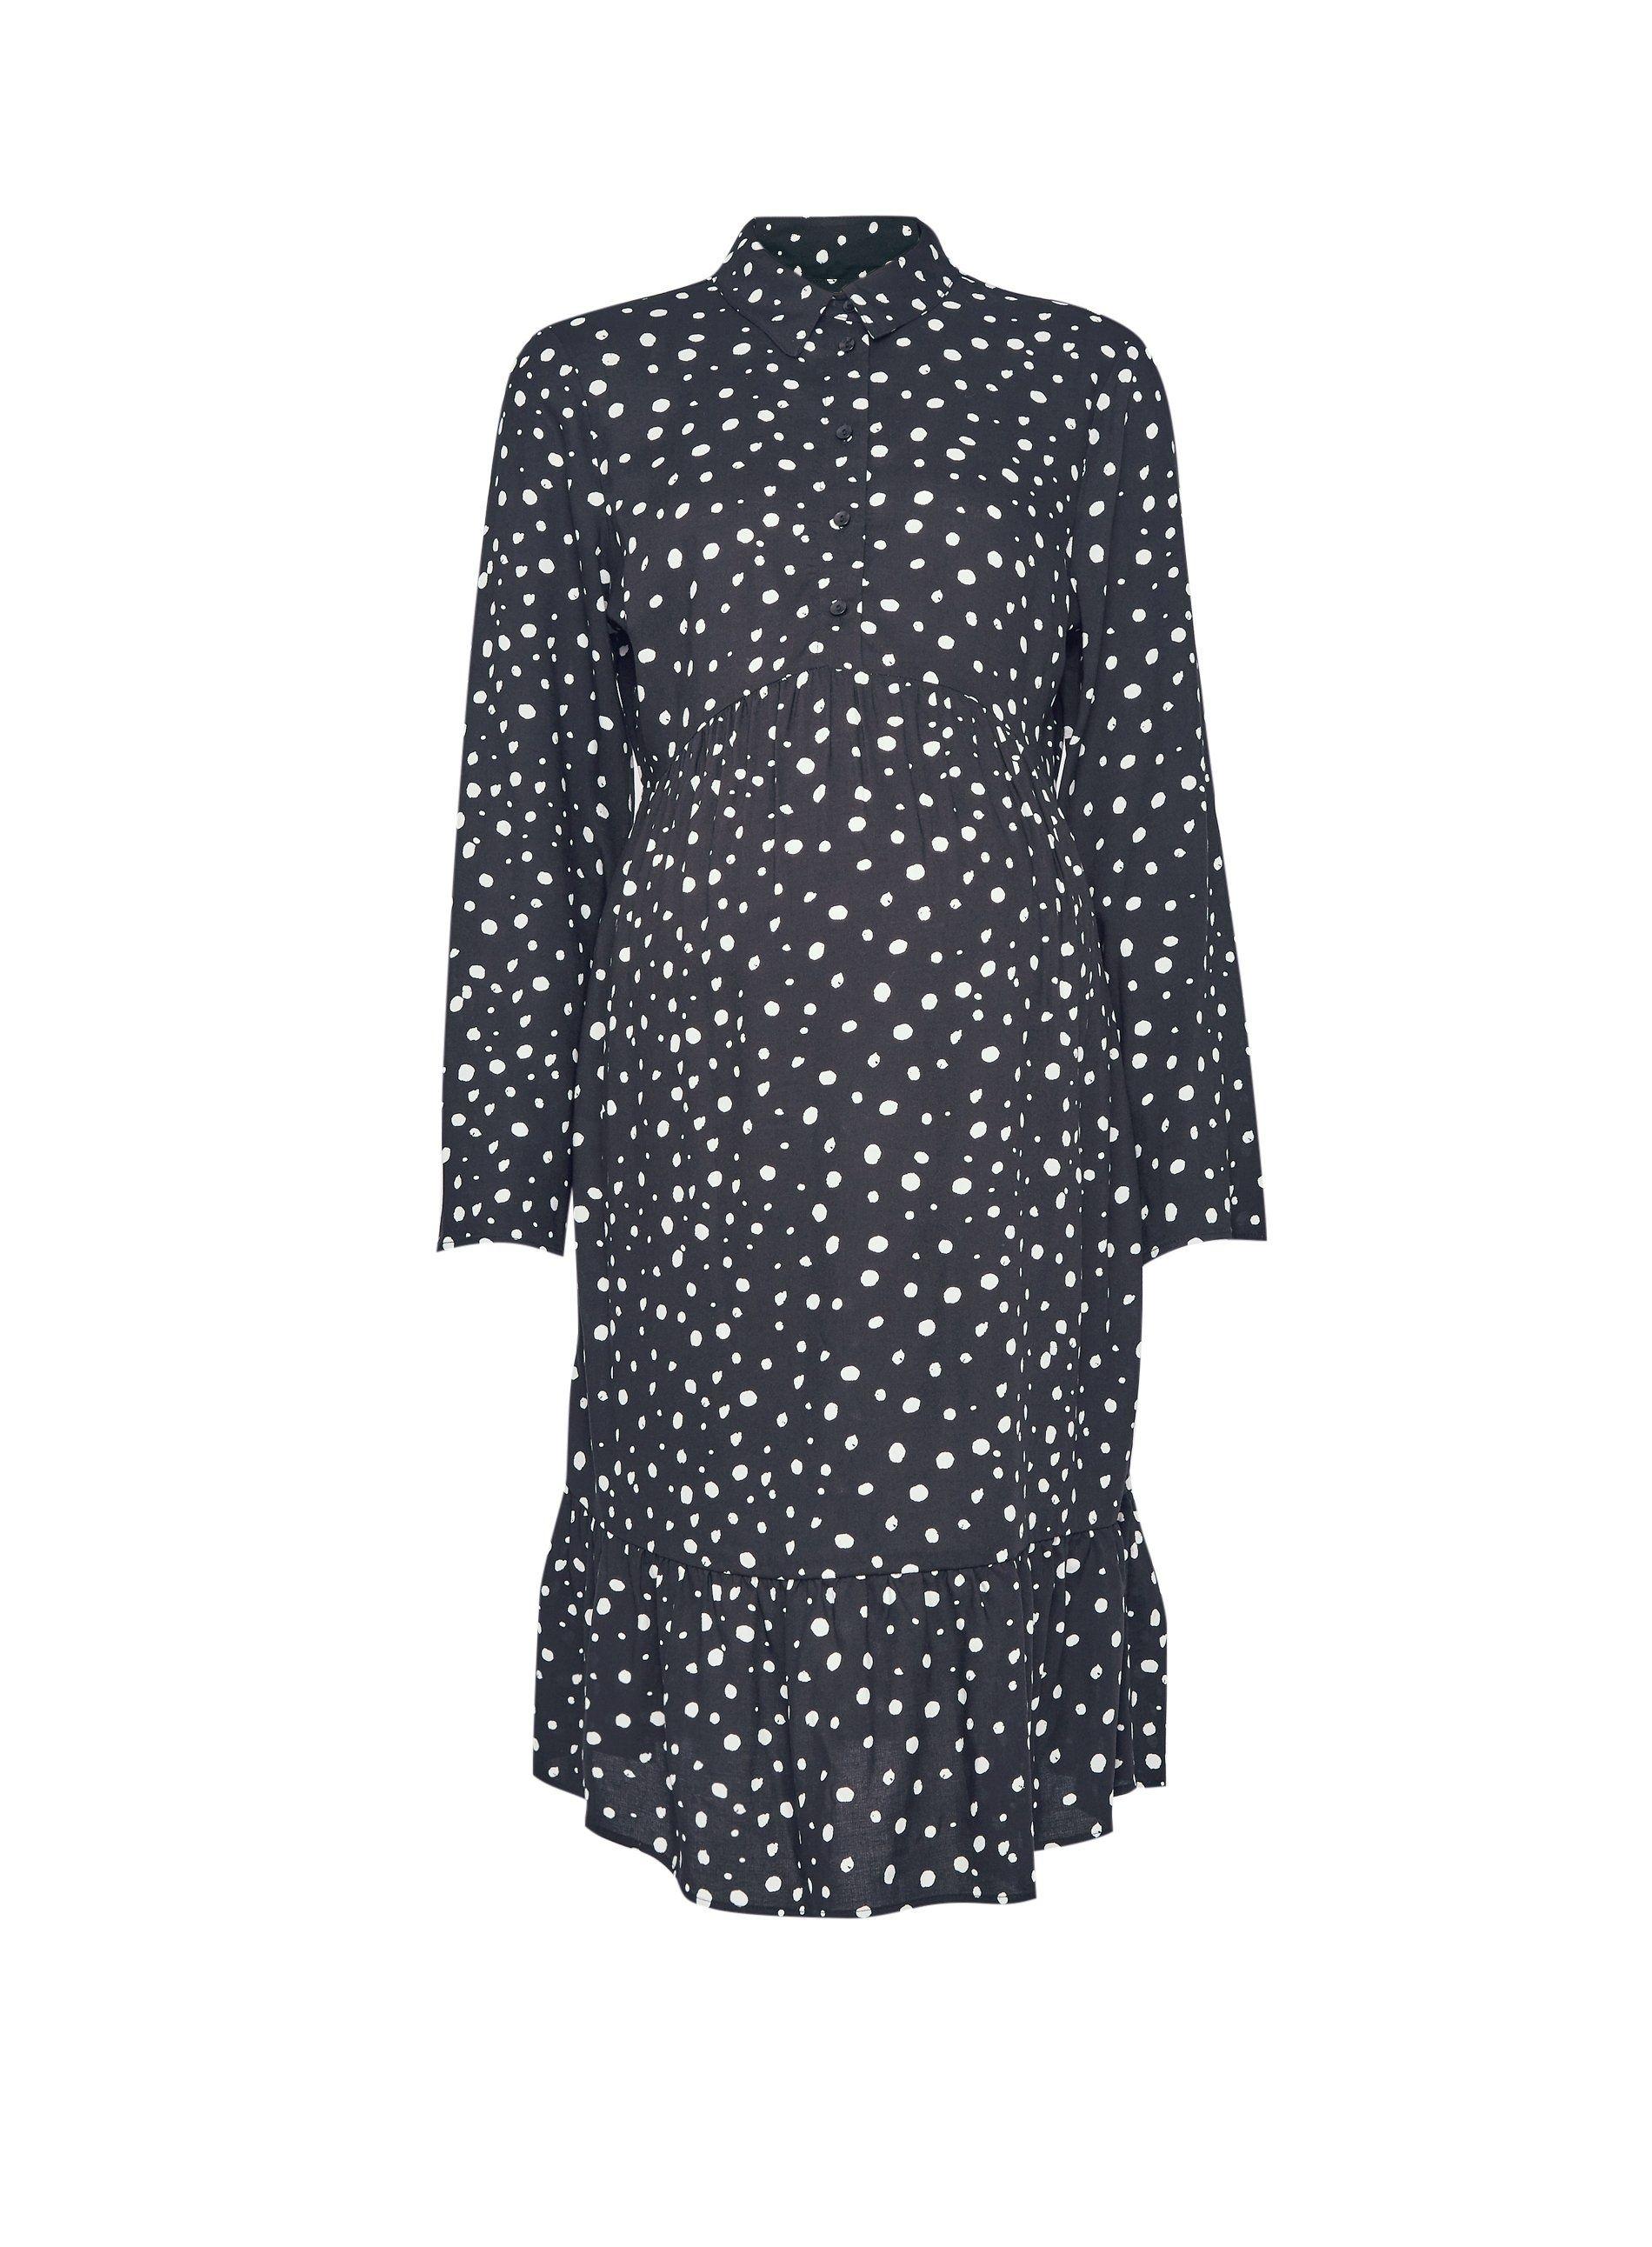 Dorothy Perkins Womens Maternity Black Spot Printed Dress Knee-Long Long Sleeve